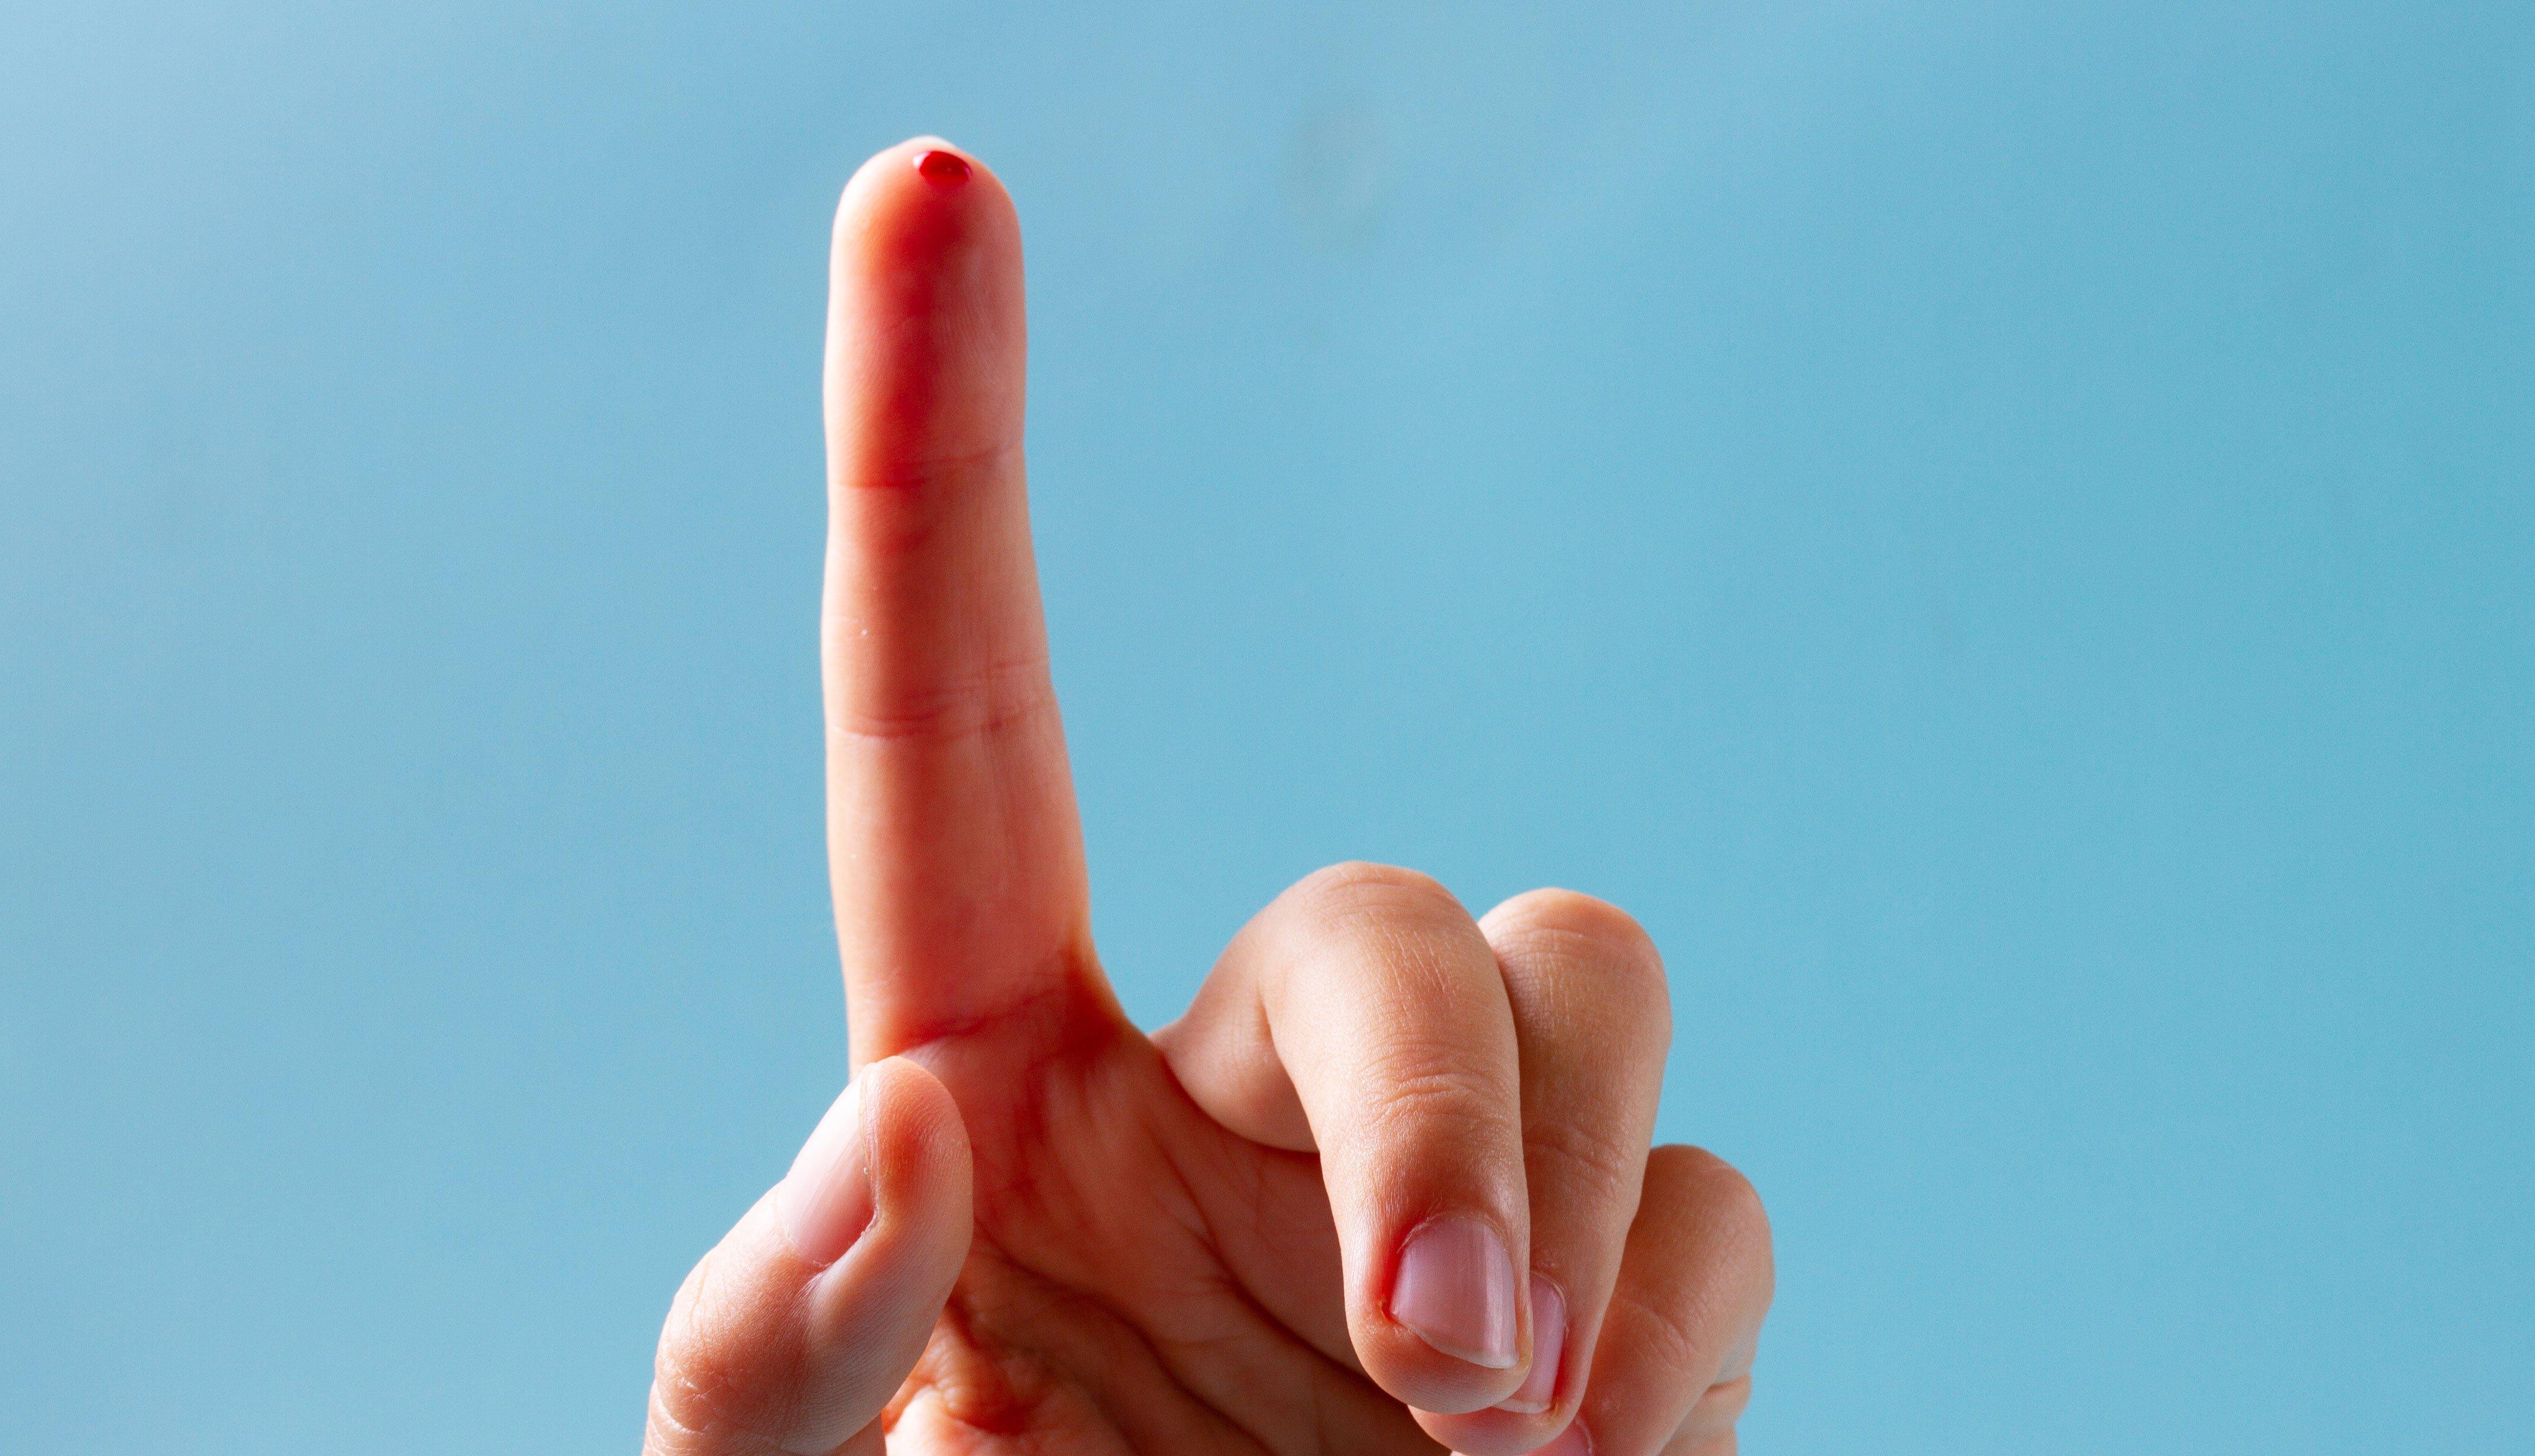 Dedo índice con un punto de sangre